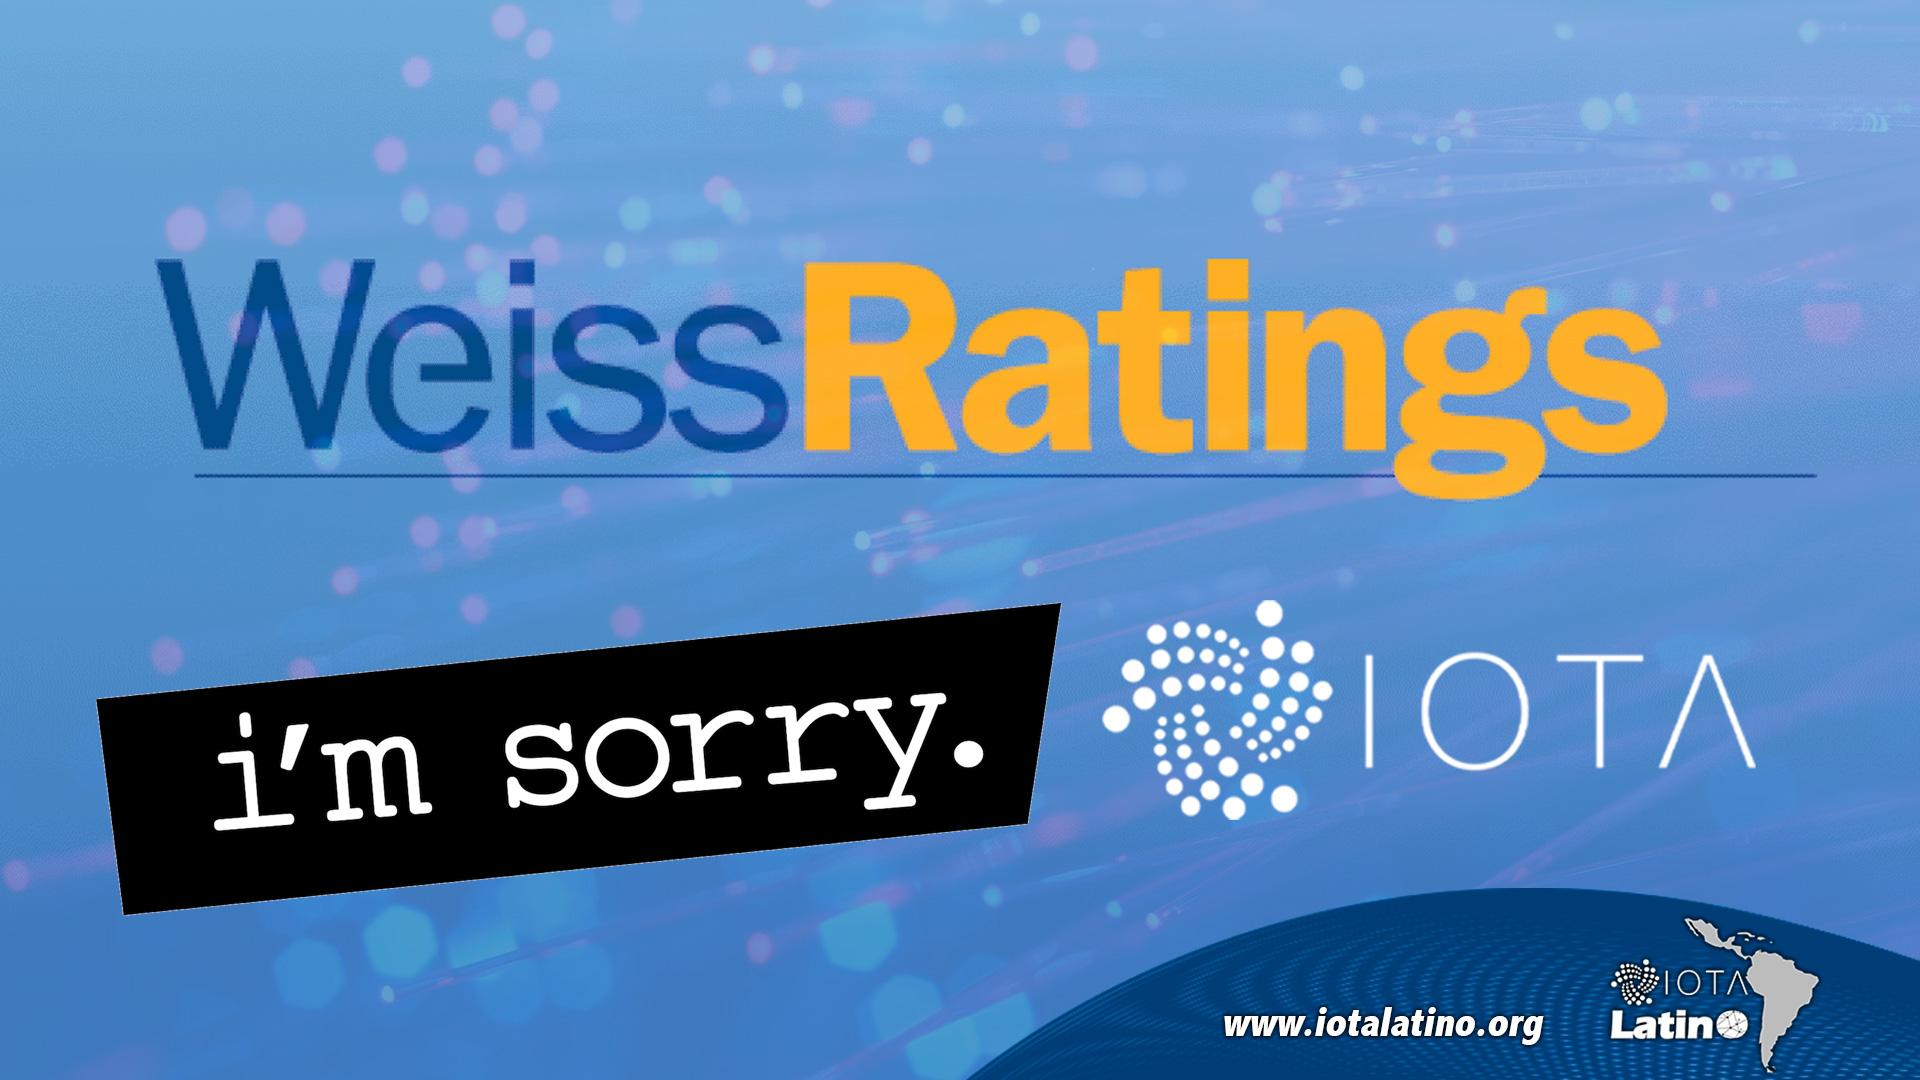 Weiss Ratings se disculpó - IOTA Latino